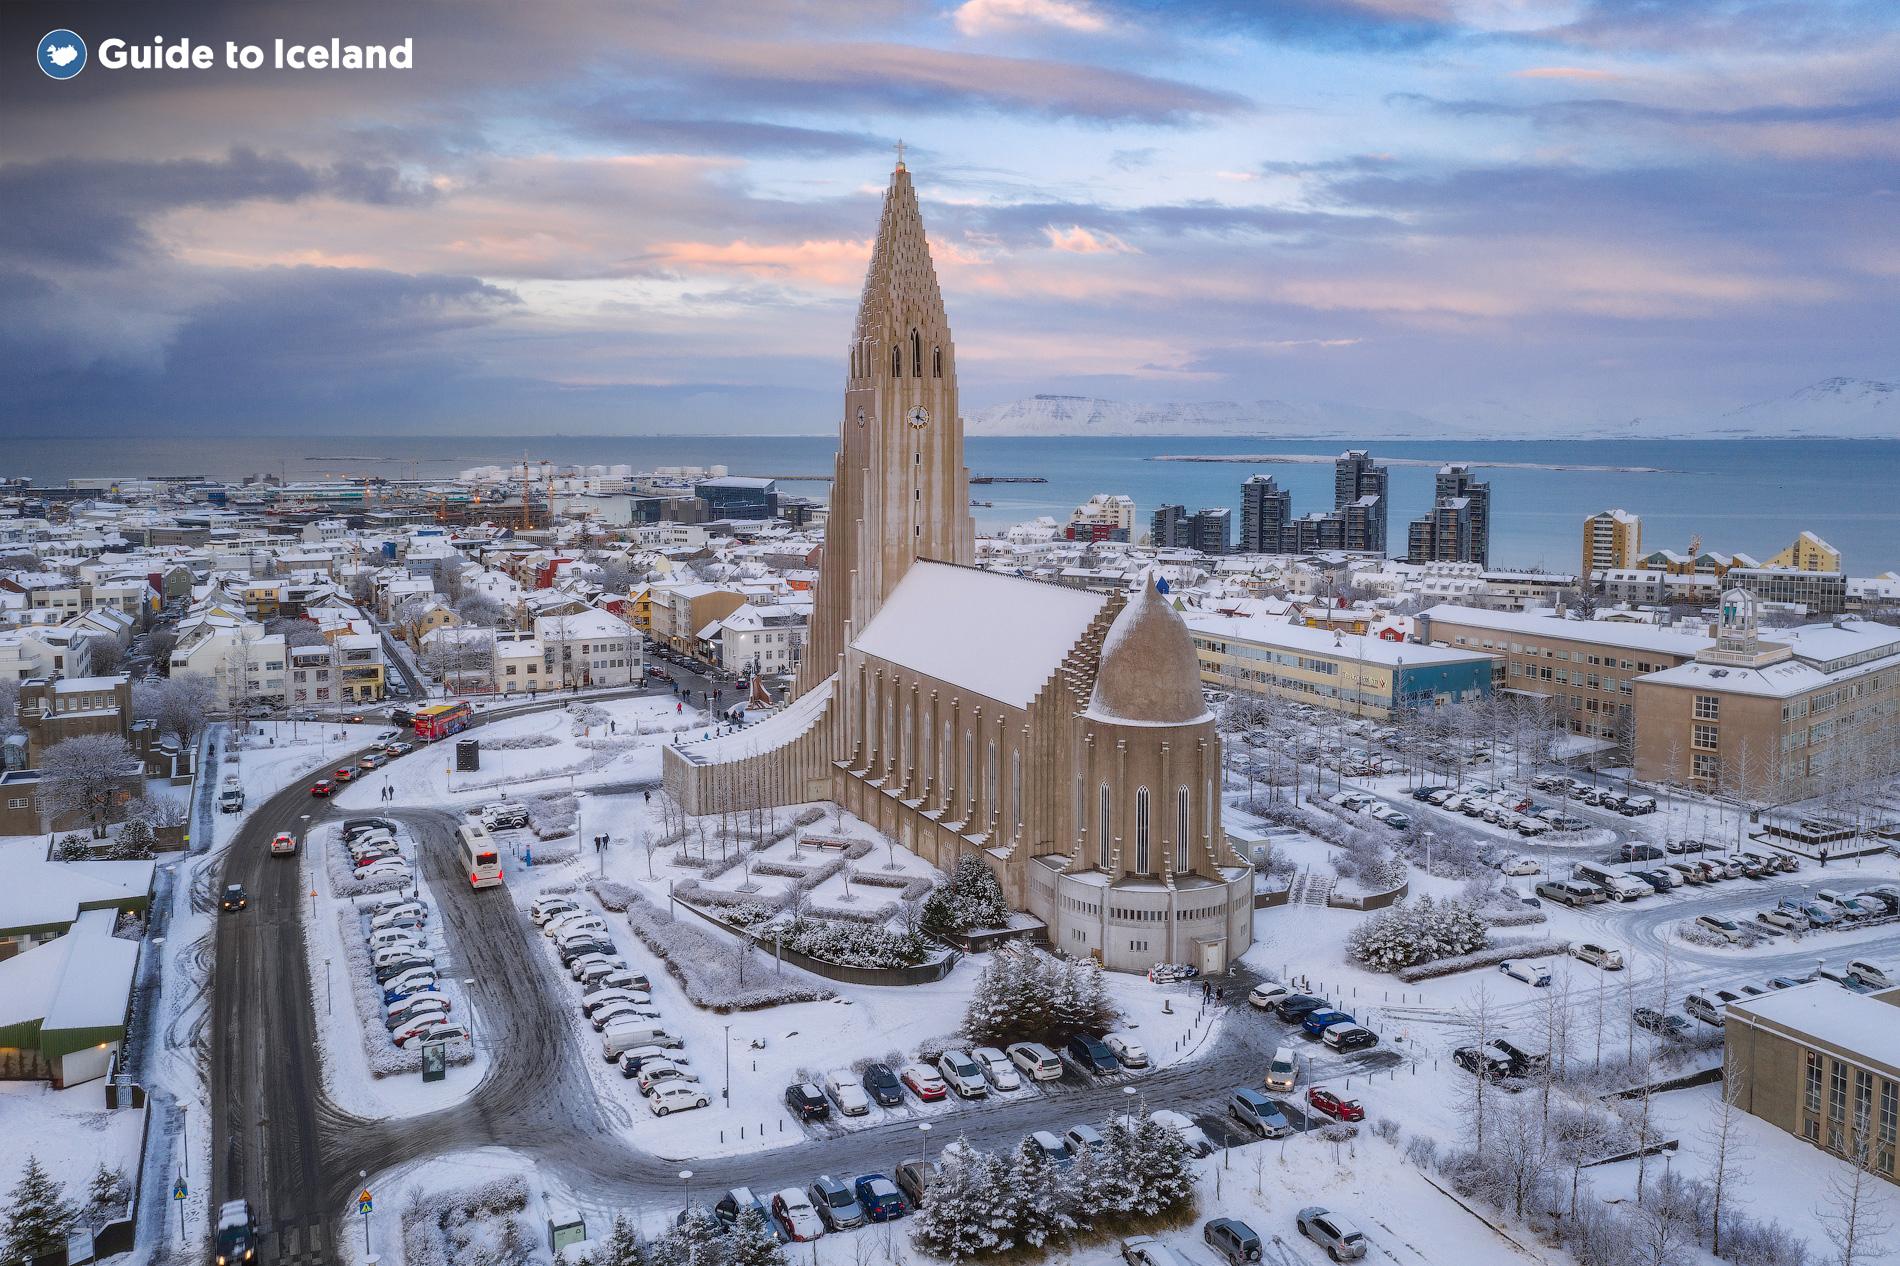 Hallgrimskirkja Church in downtown Reykjavik, covered in a blanket of winter snow.